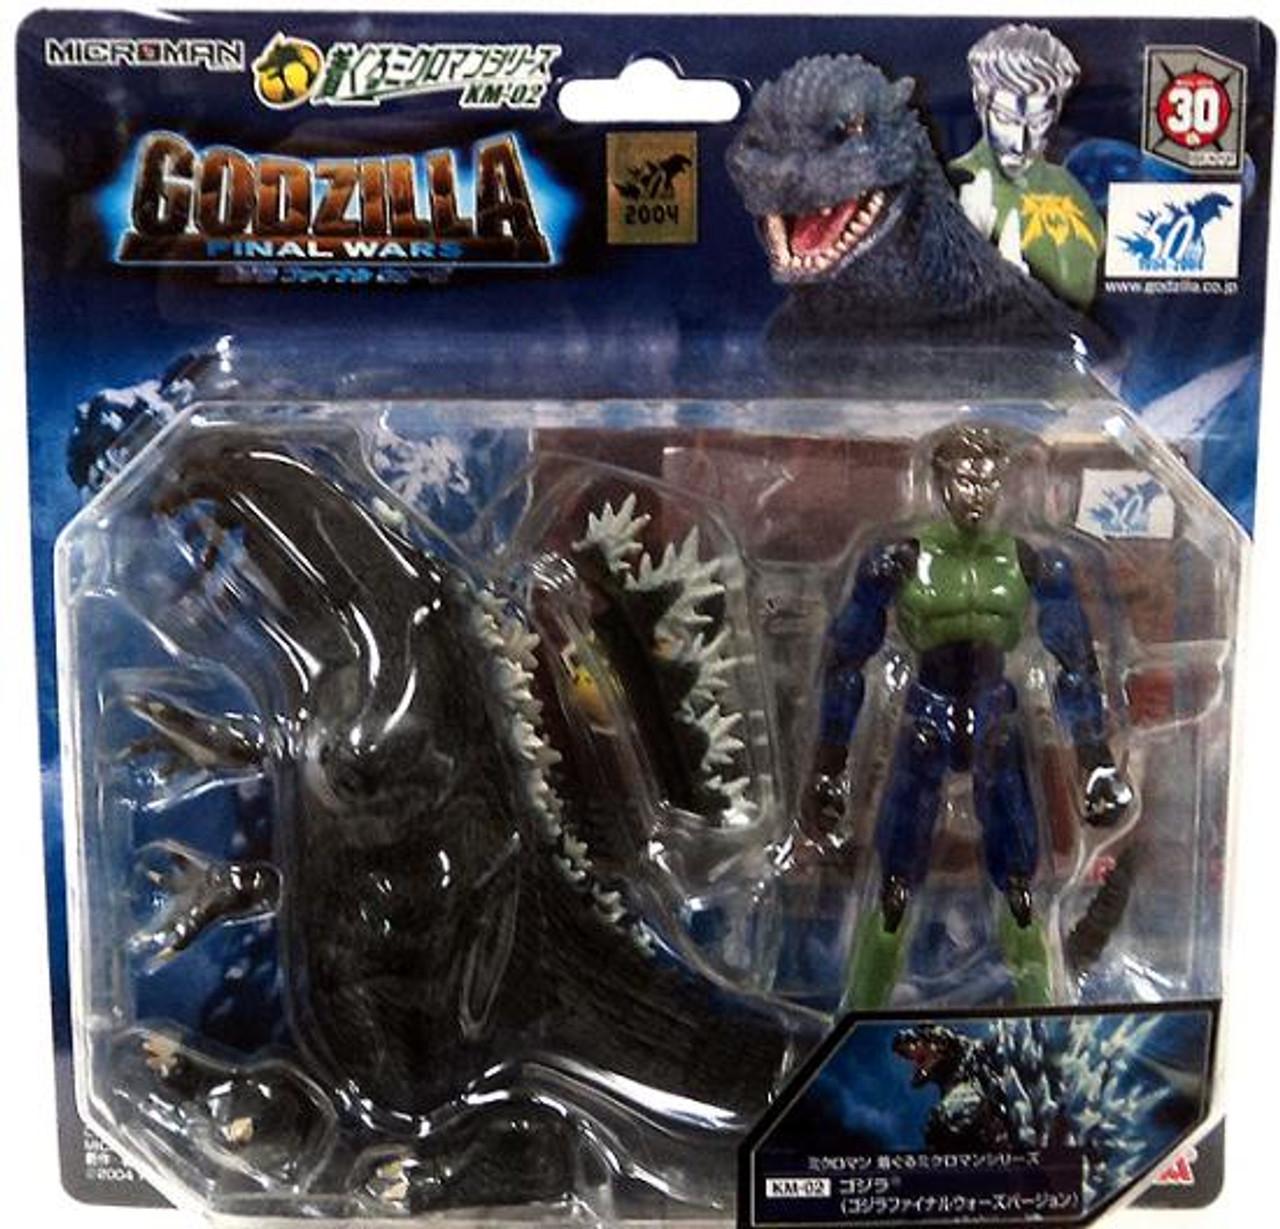 Microman Godzilla Figure KM-02 [Final Wars Version]